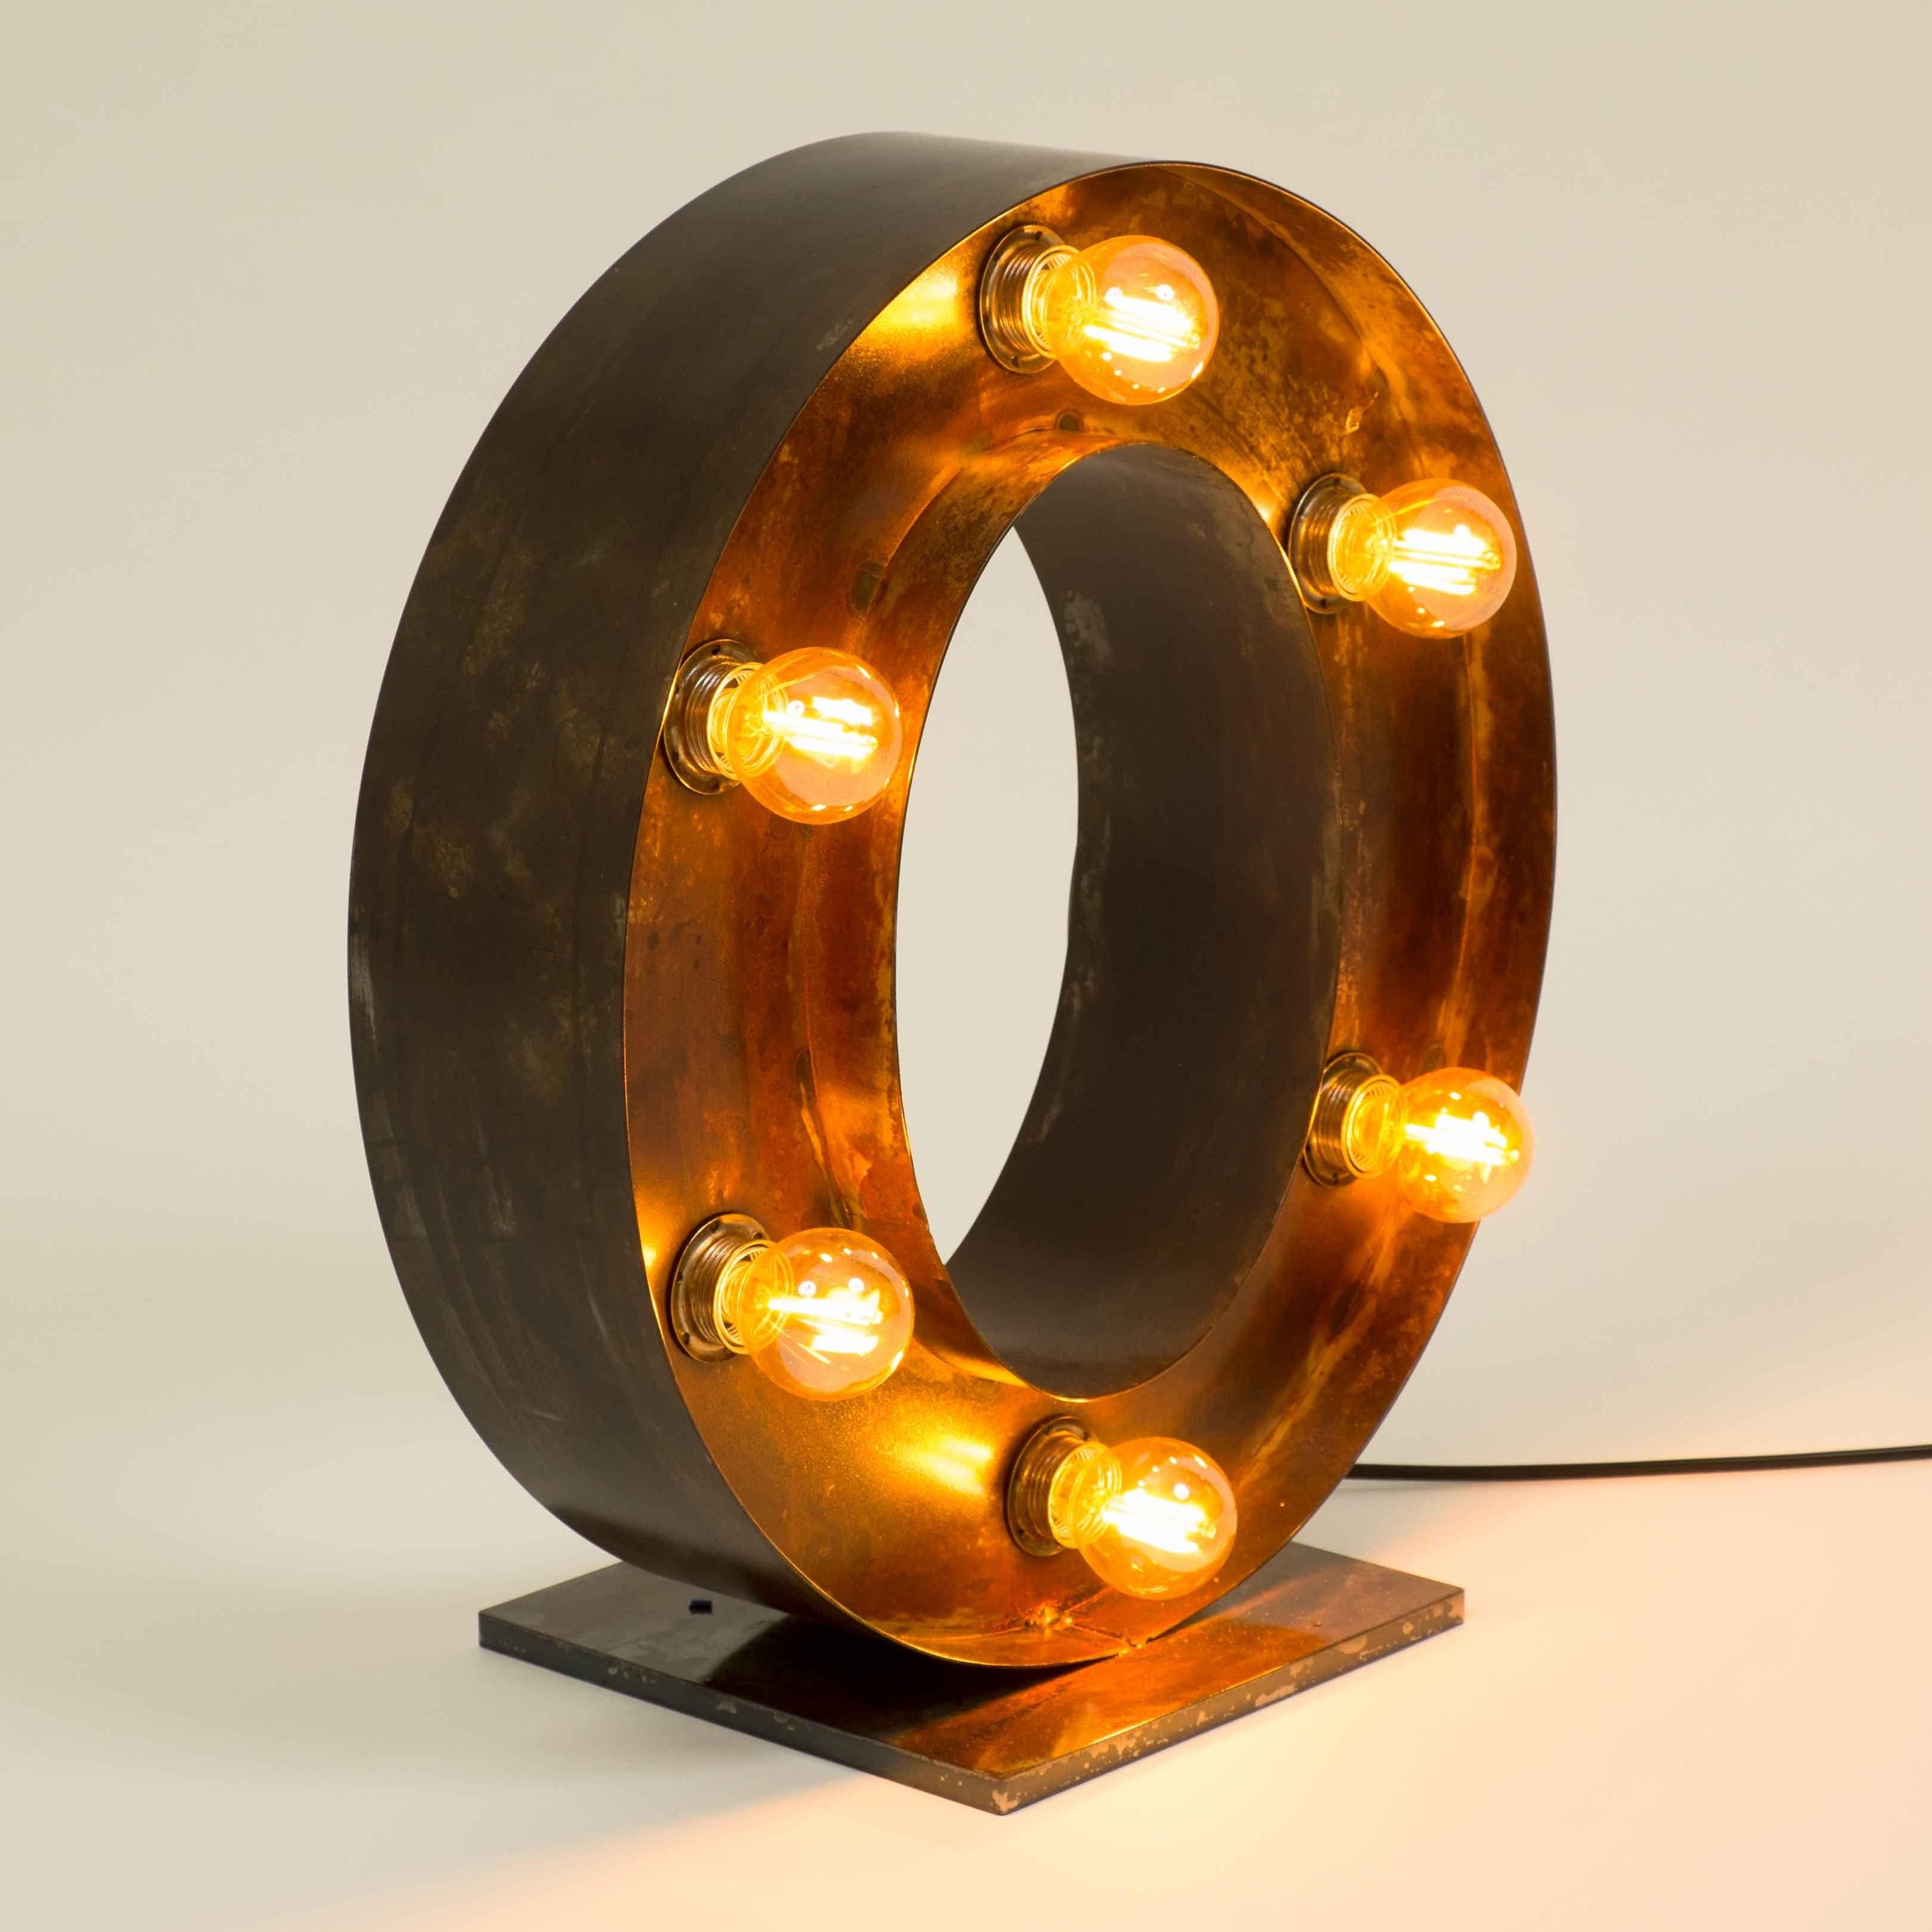 Letra C Metalicas Decorativas Iluminadas